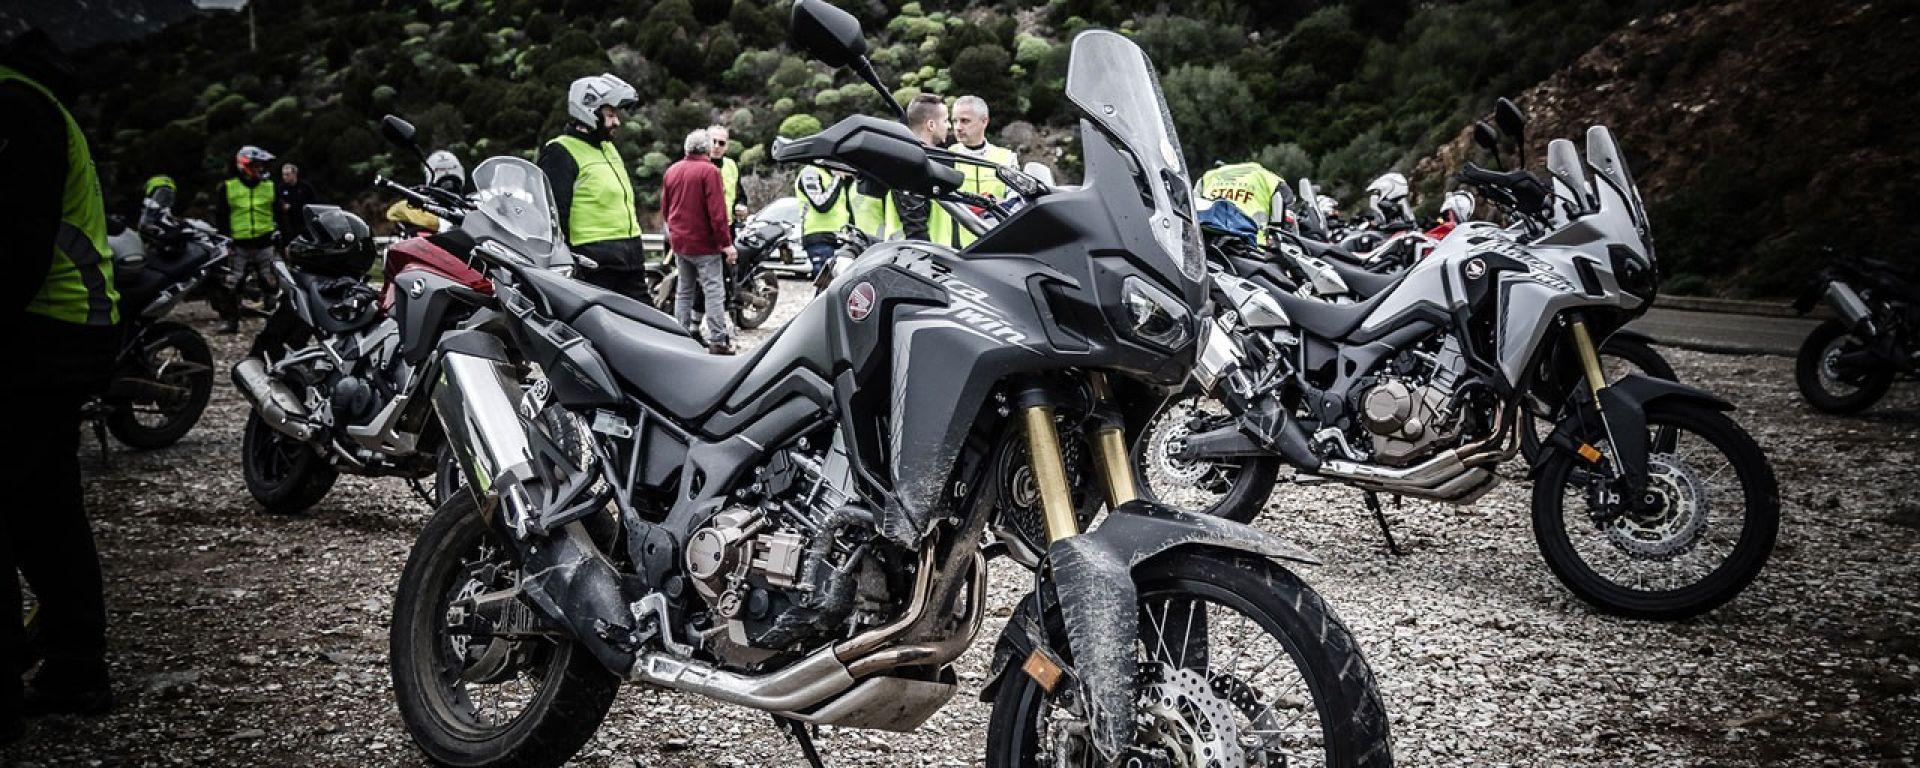 Honda Africa Twin True Adventure Sardegna 2016